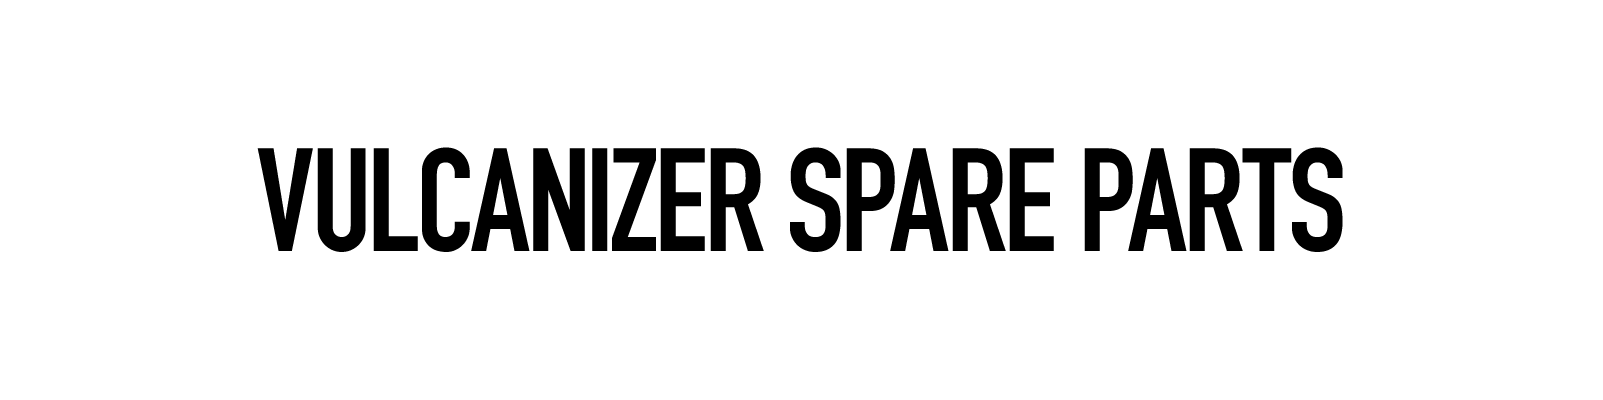 Vulcanizer Spare Parts